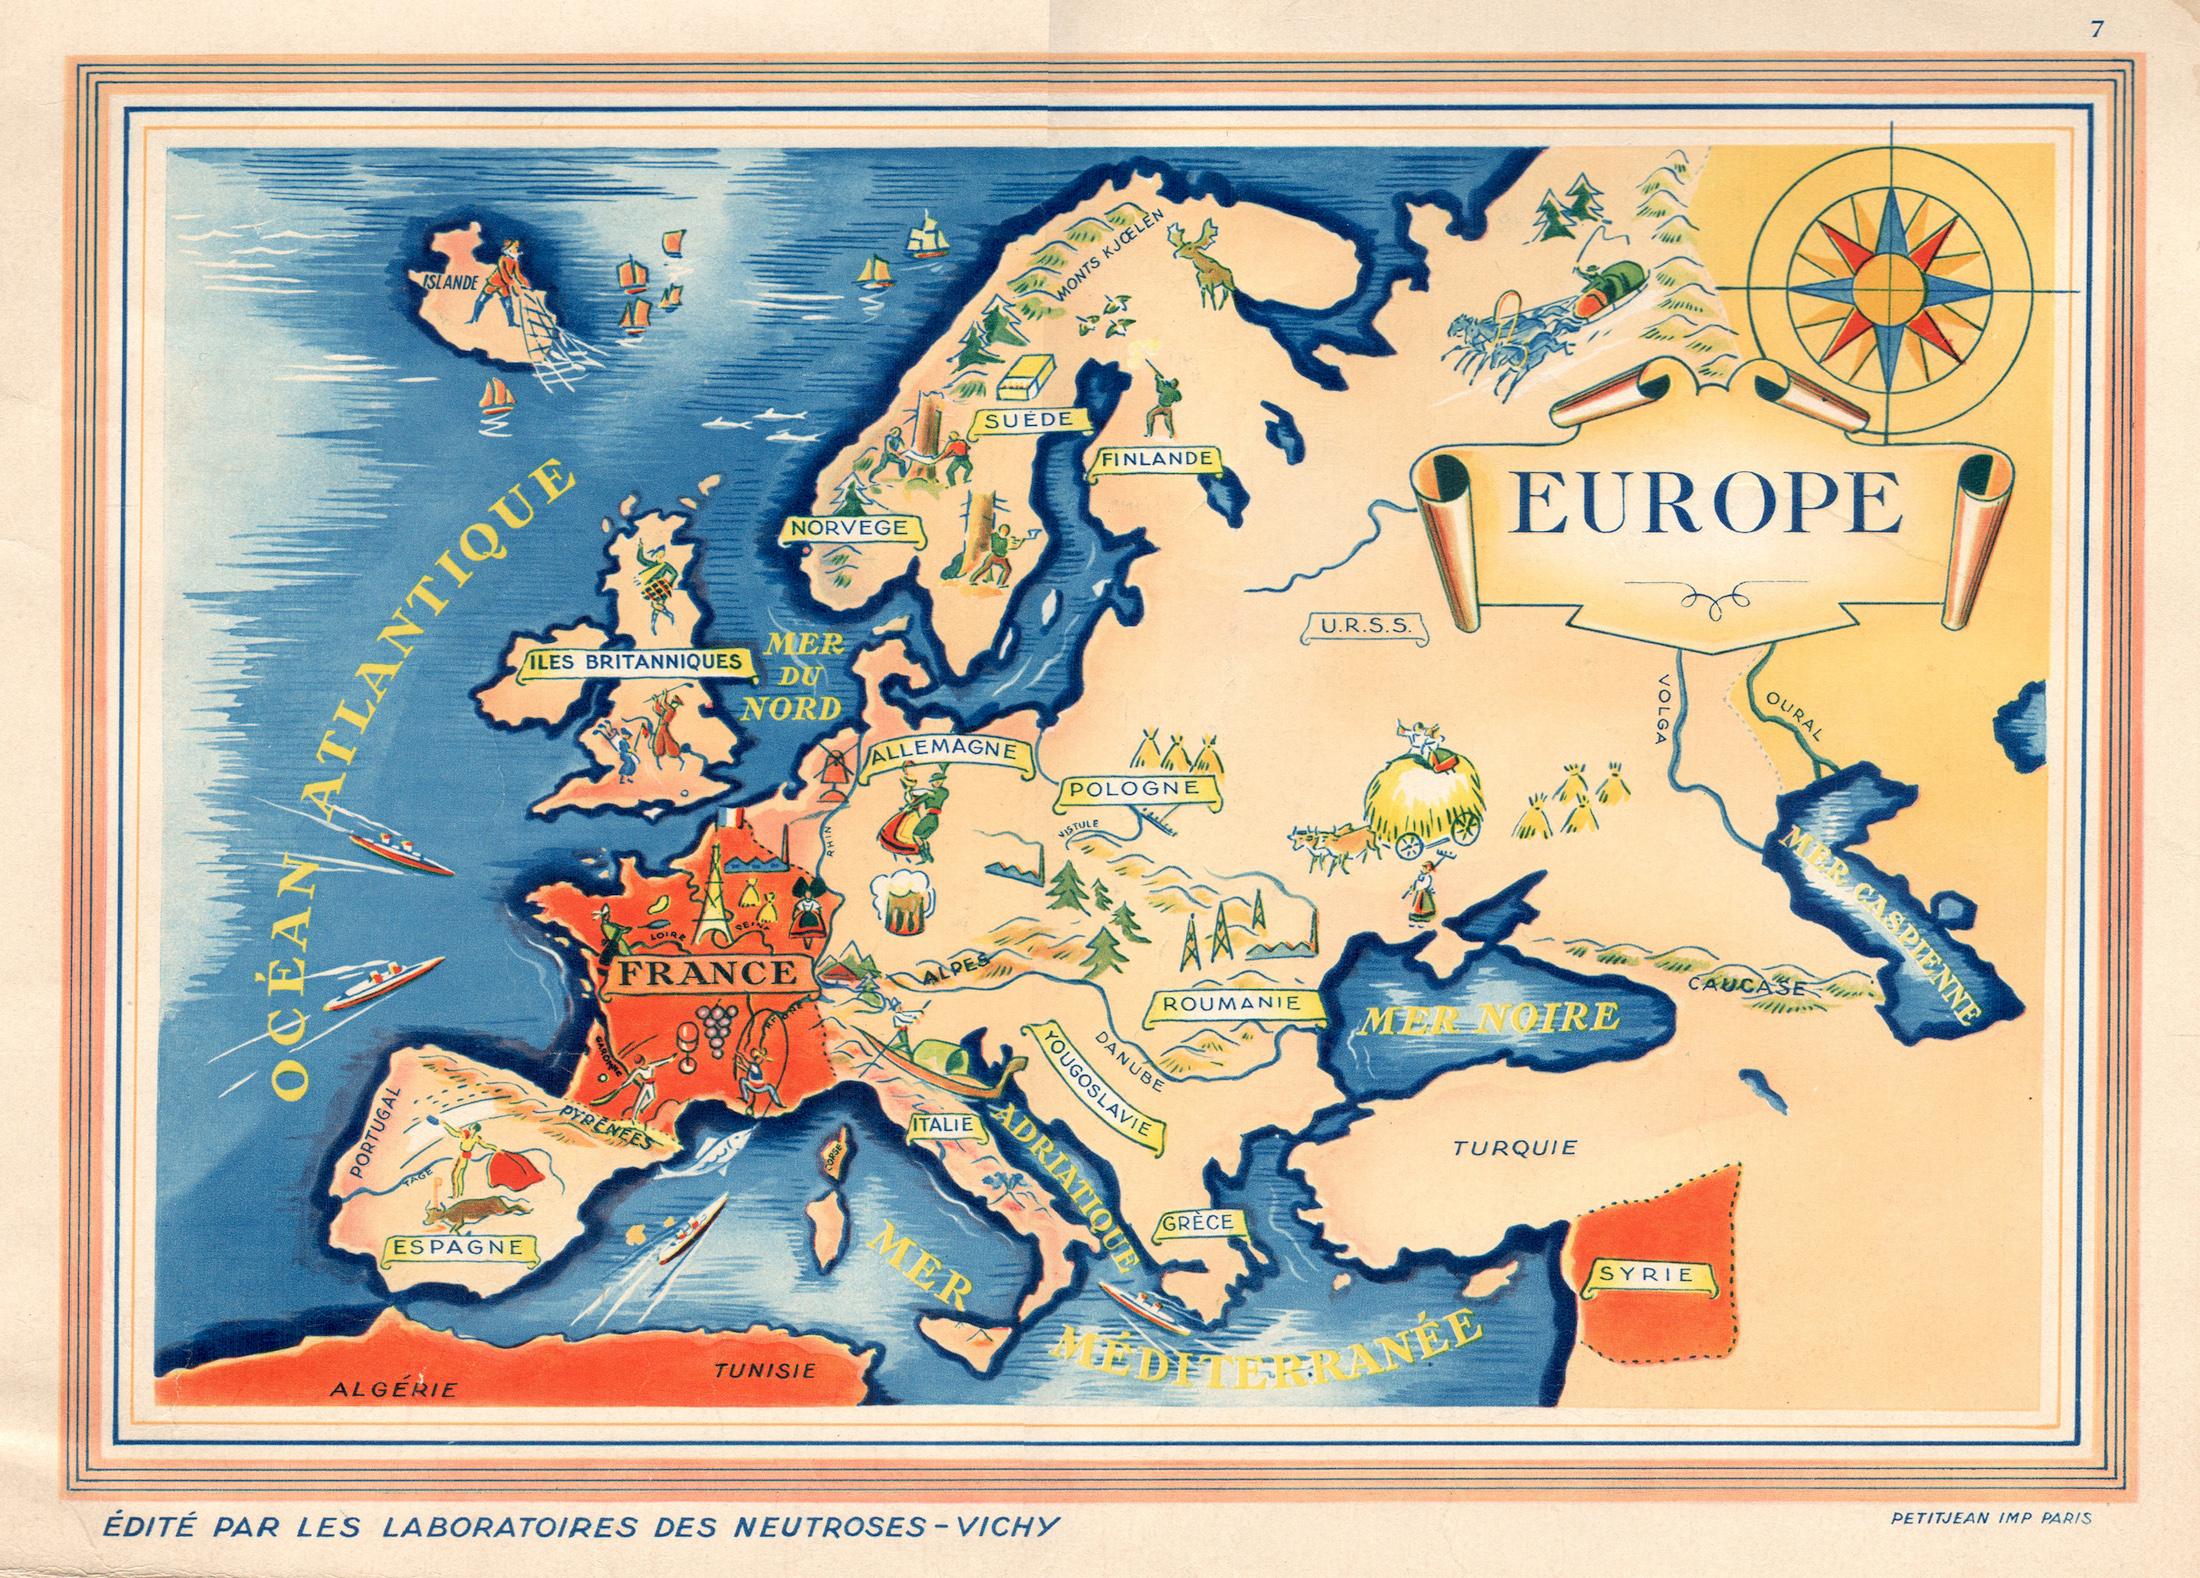 vichy-europa